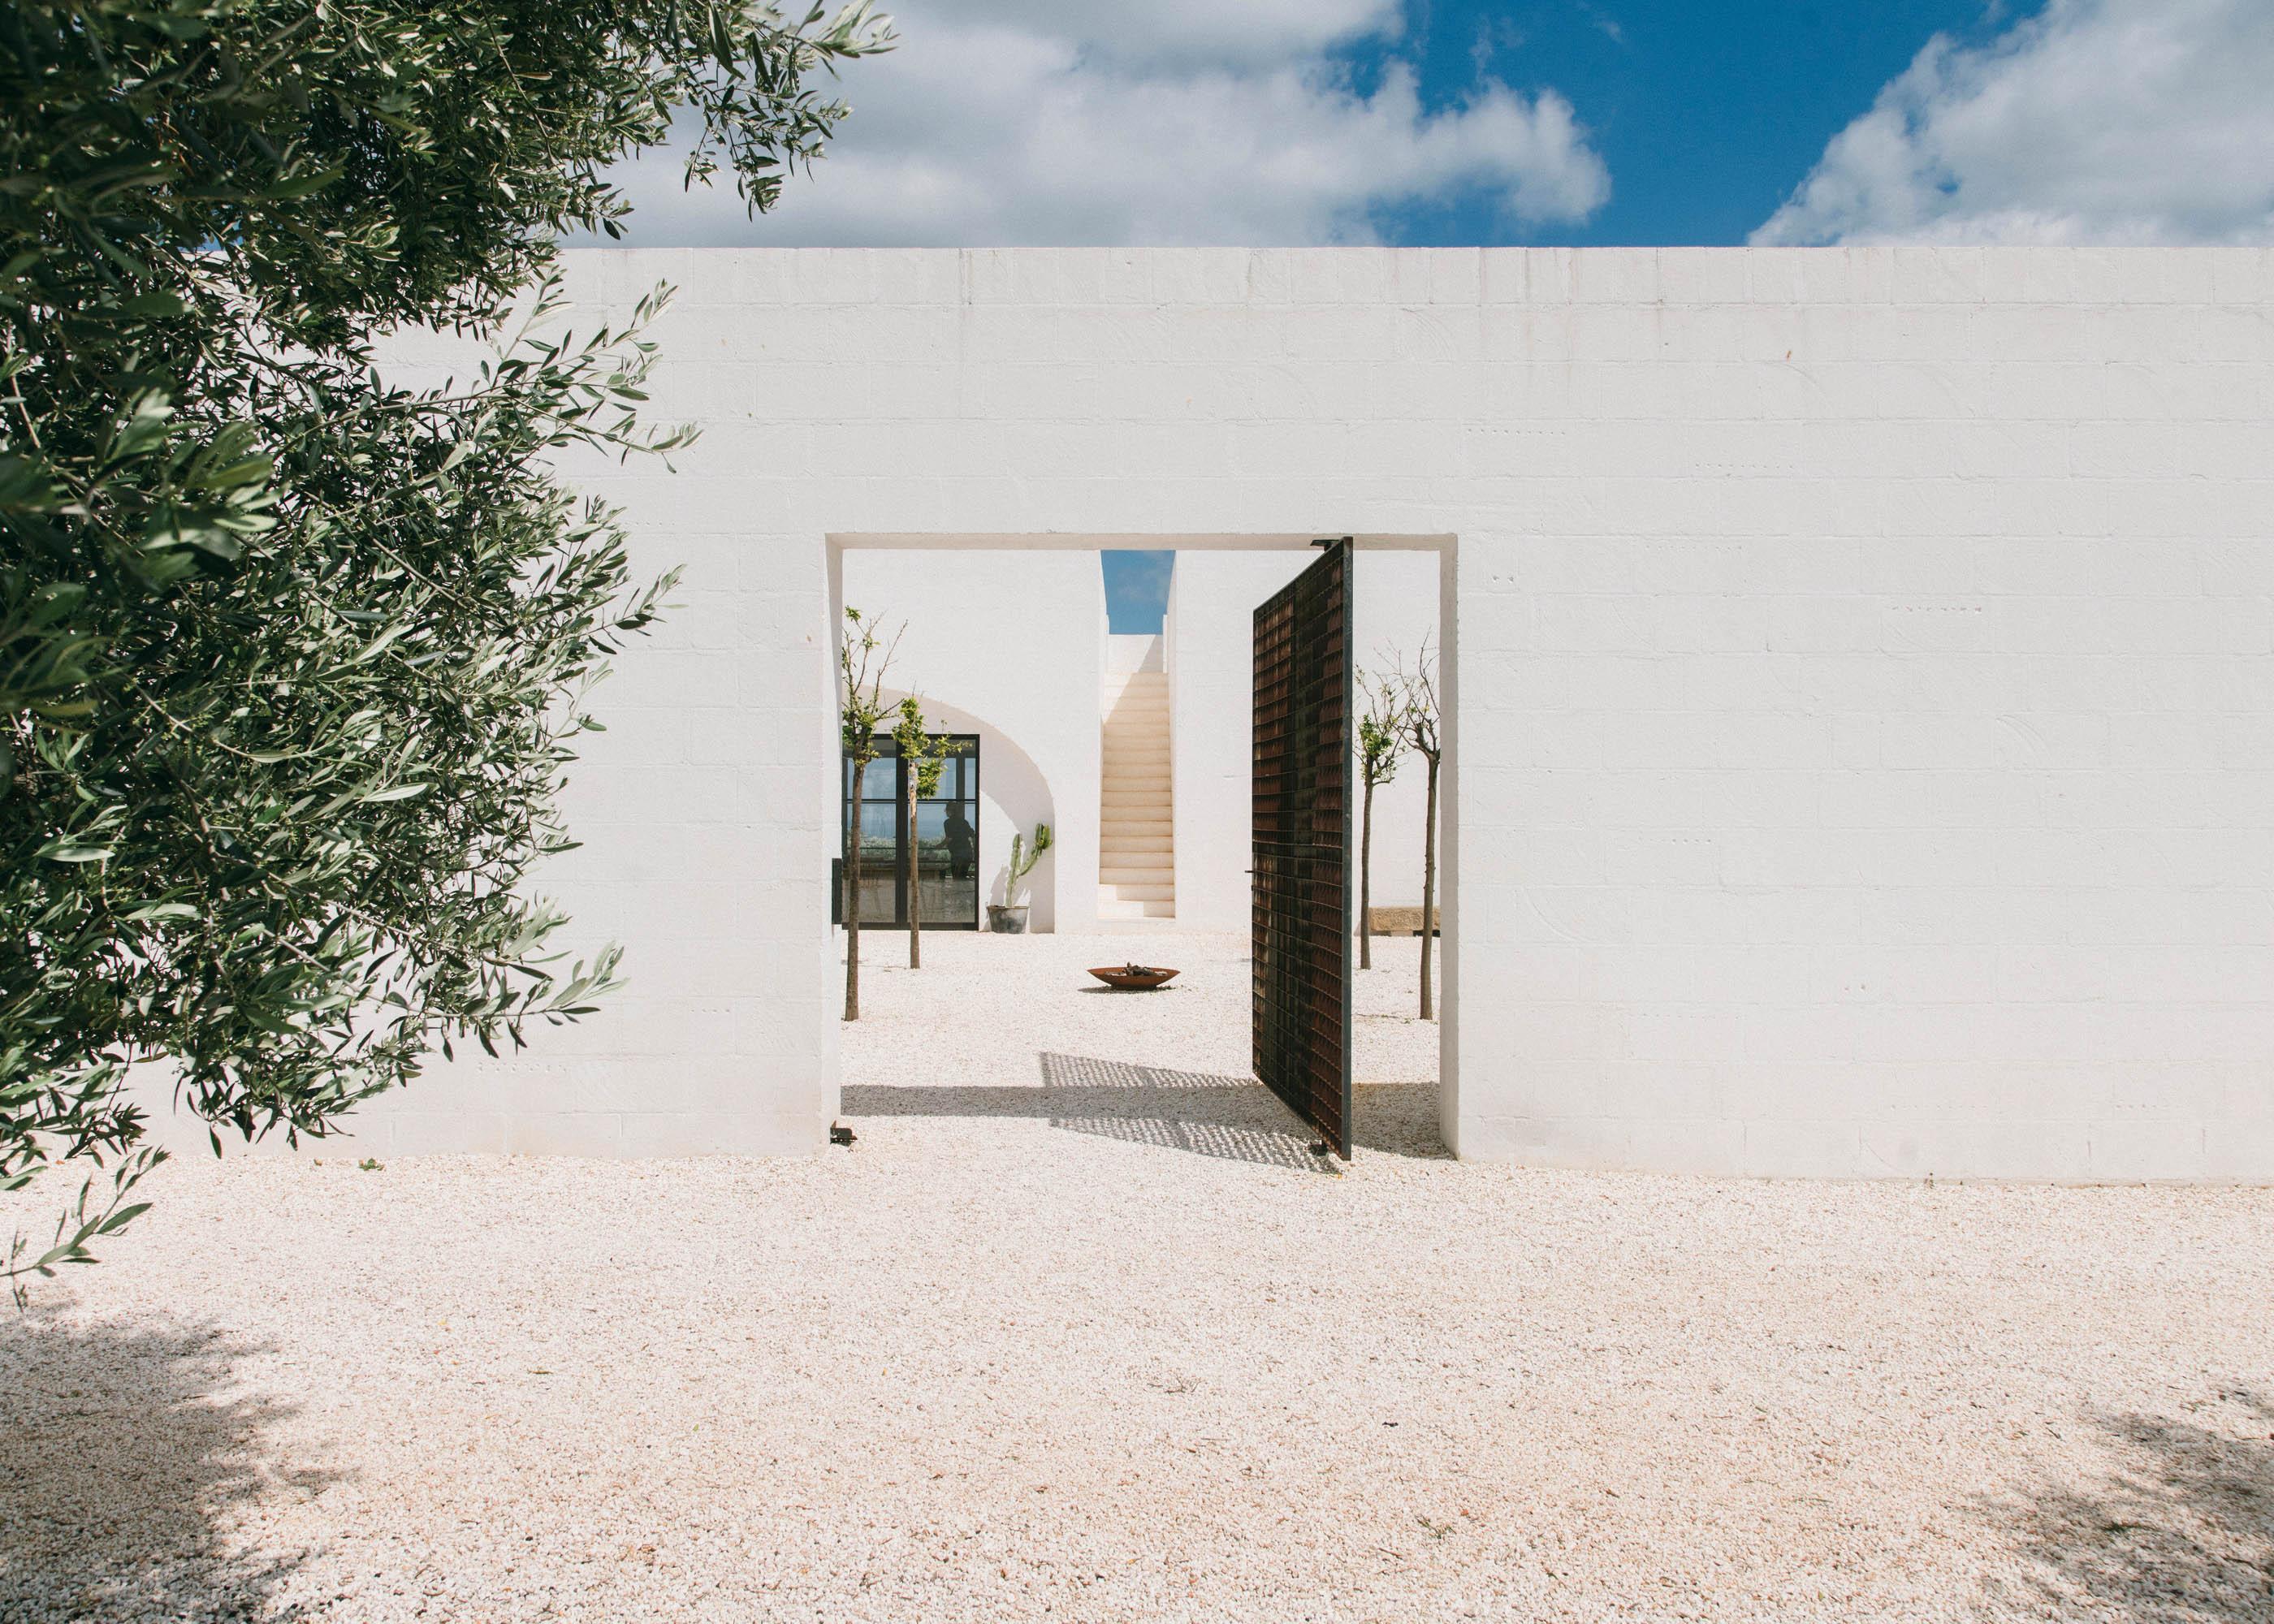 #editorial #italy #puglia #masseria #morosseta #openhouse #architecture